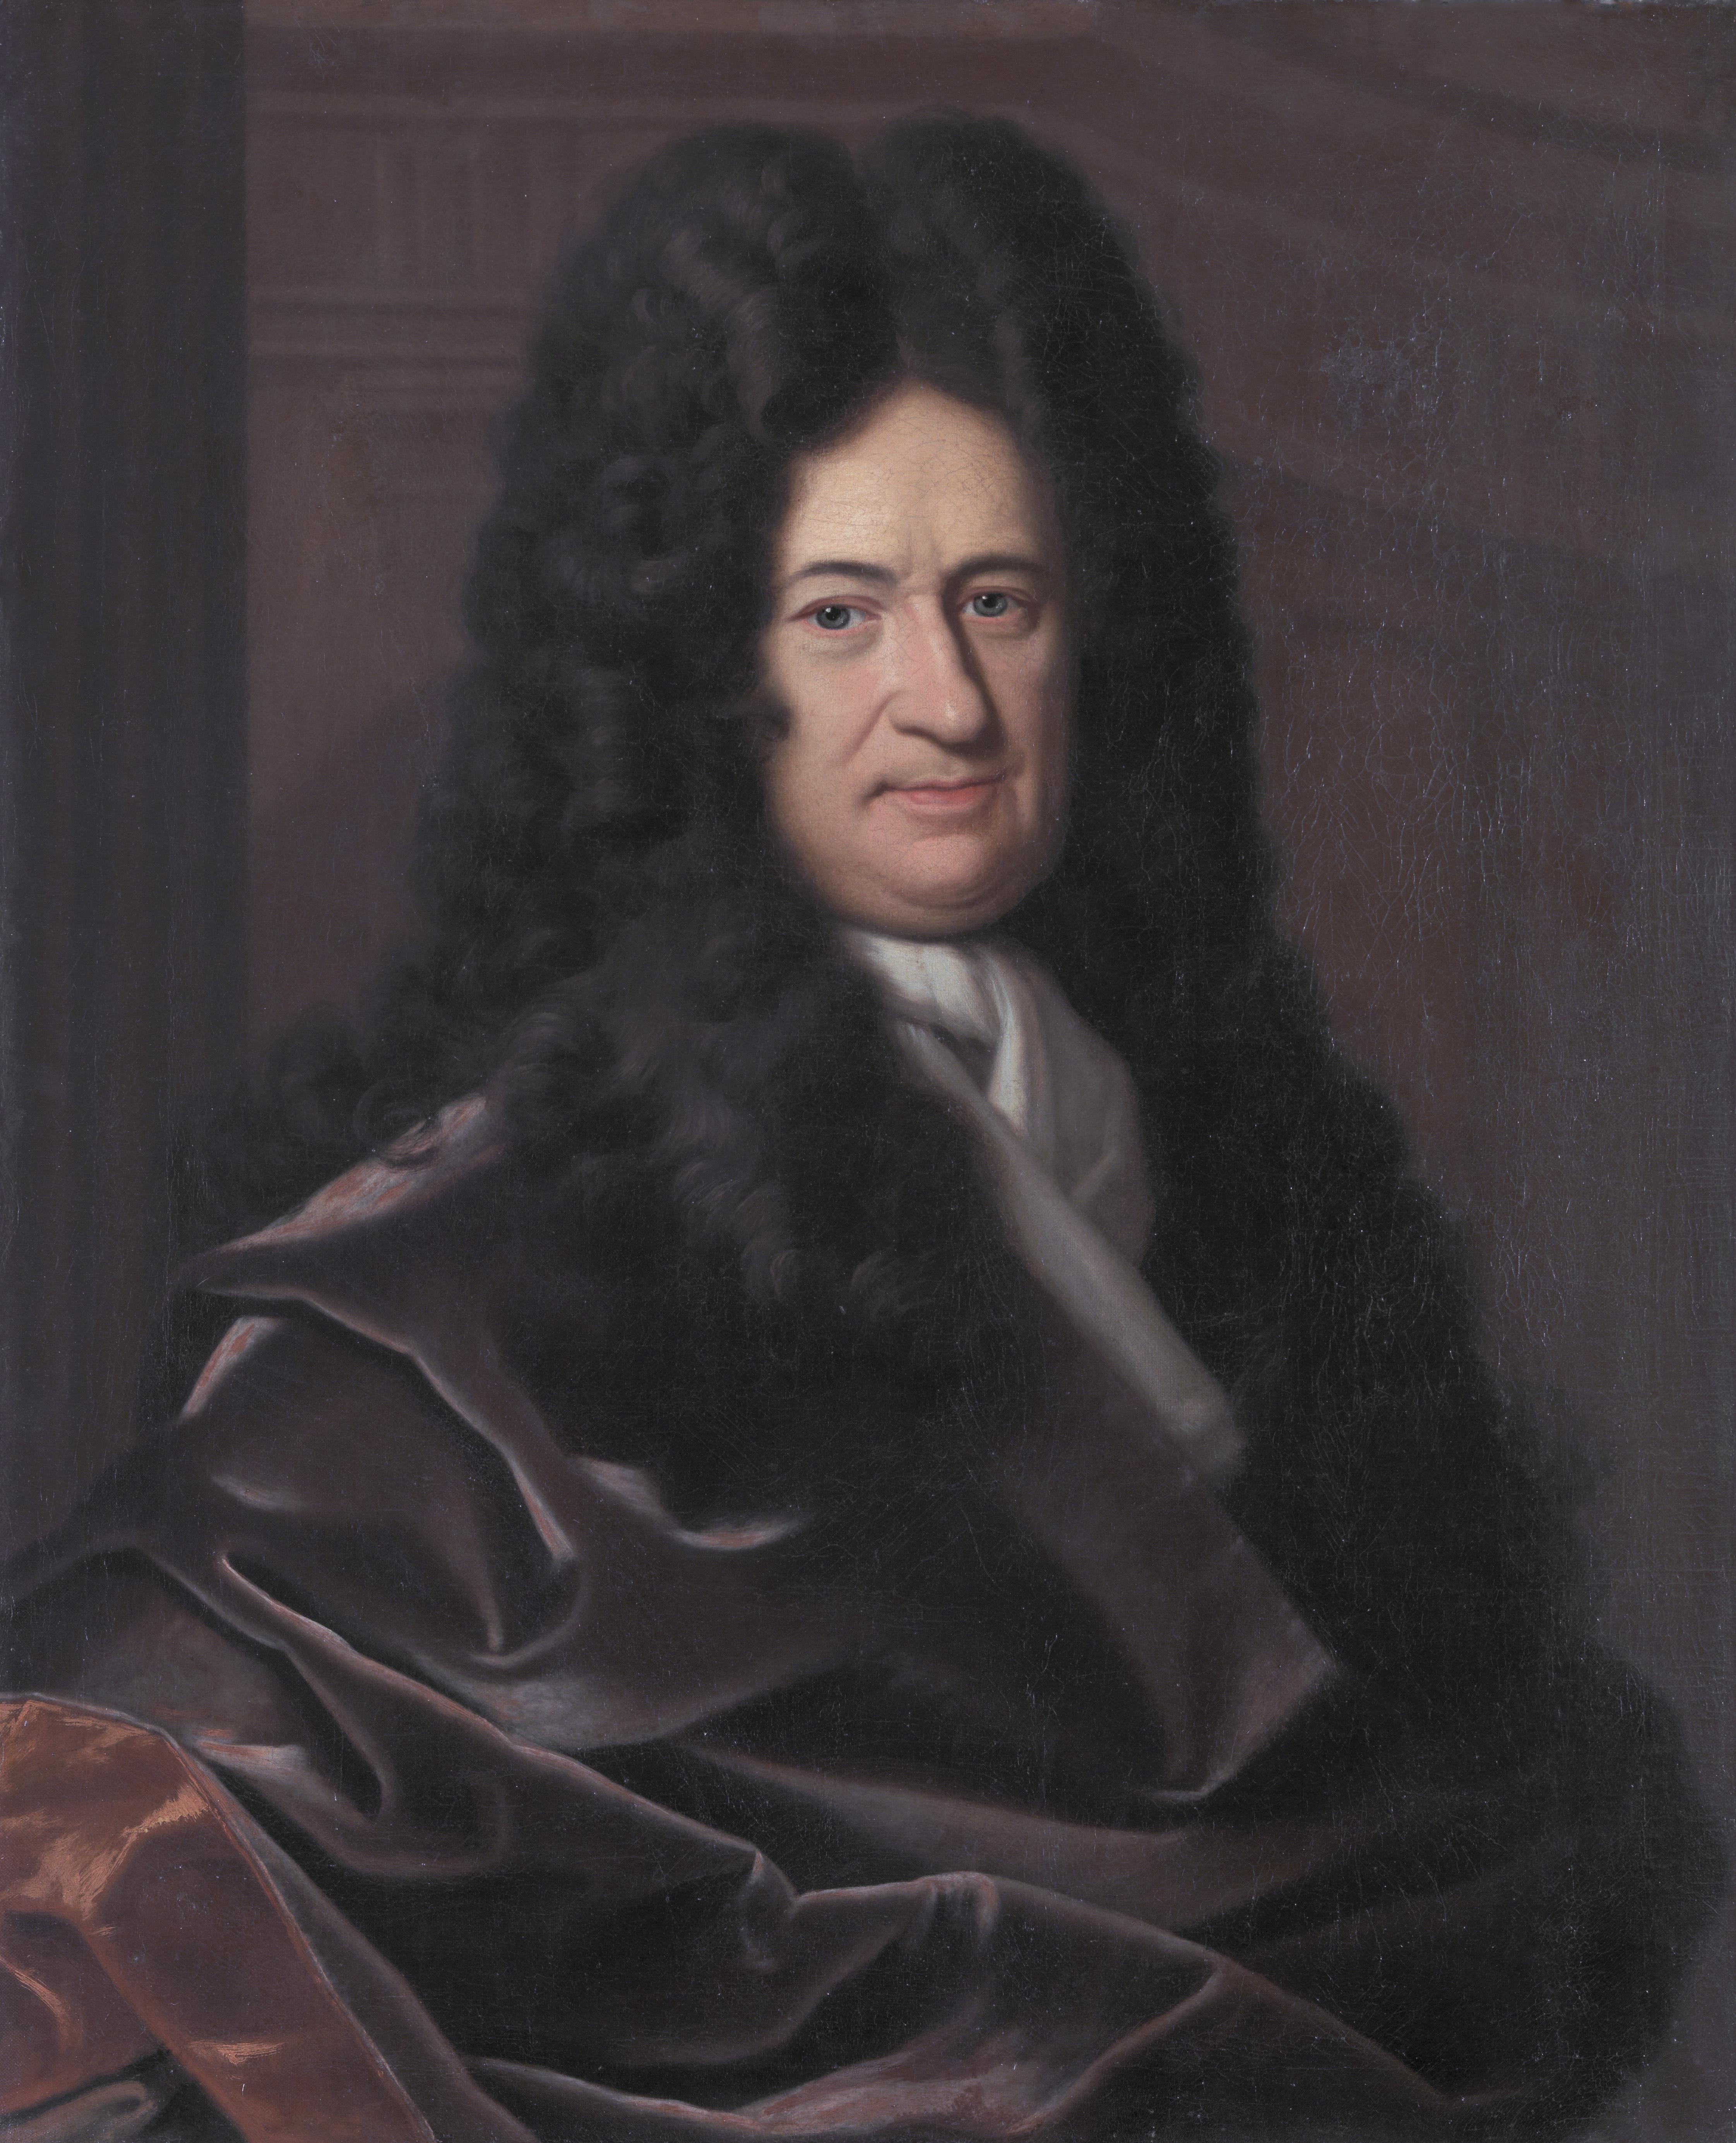 Gottfried Leibniz